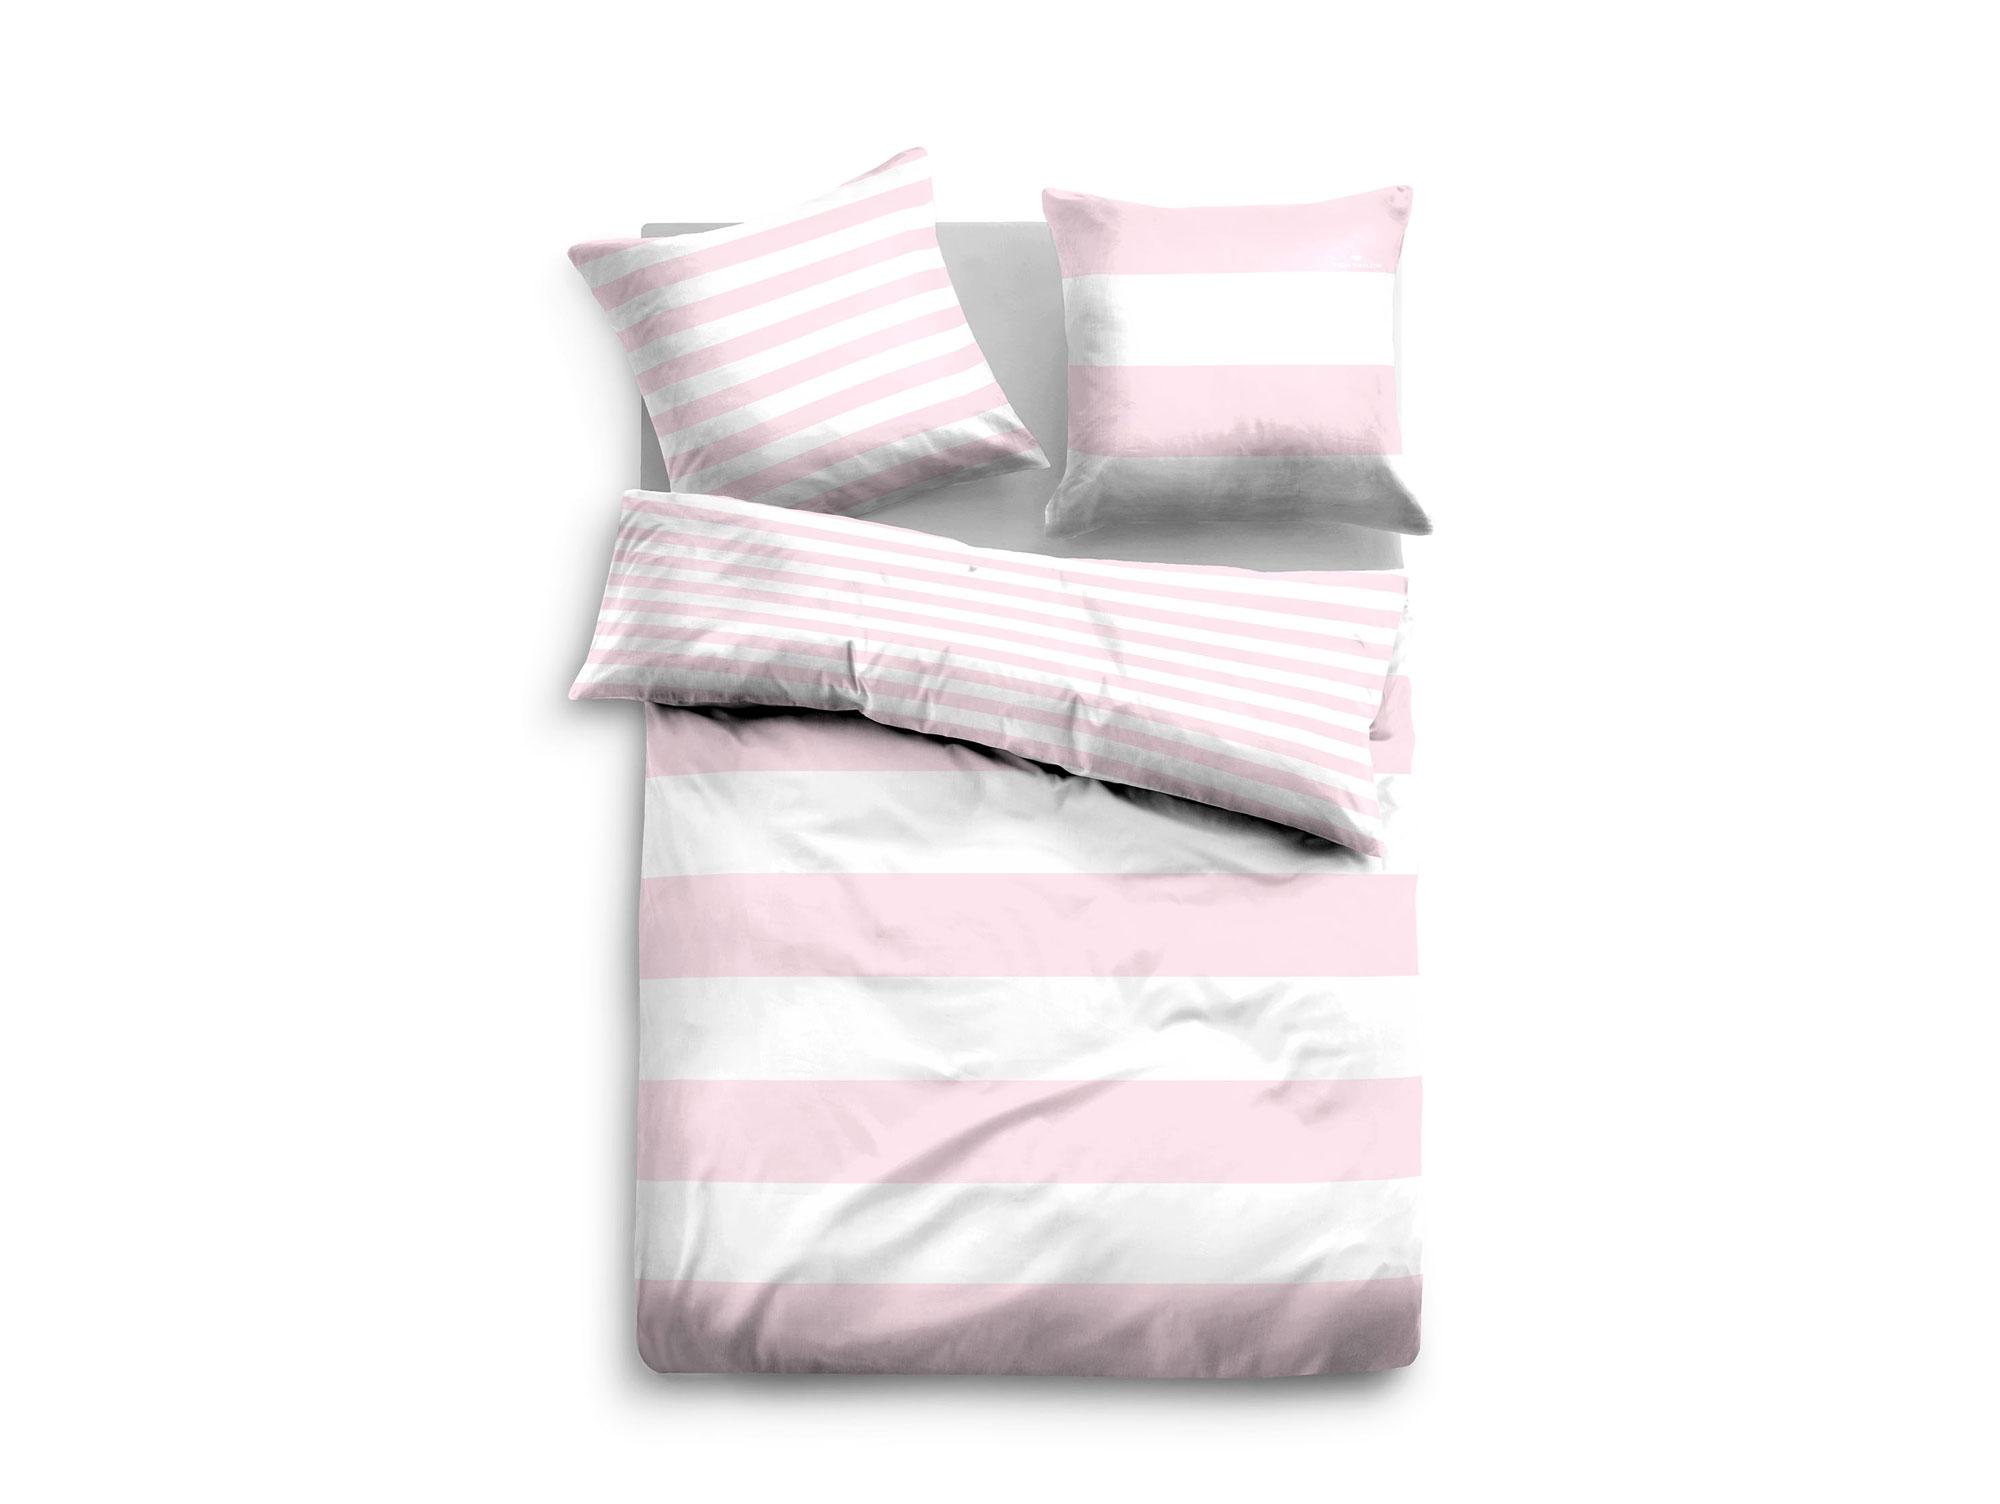 tom tailor bettw sche linon bed linen 135x200 80x80 cm. Black Bedroom Furniture Sets. Home Design Ideas